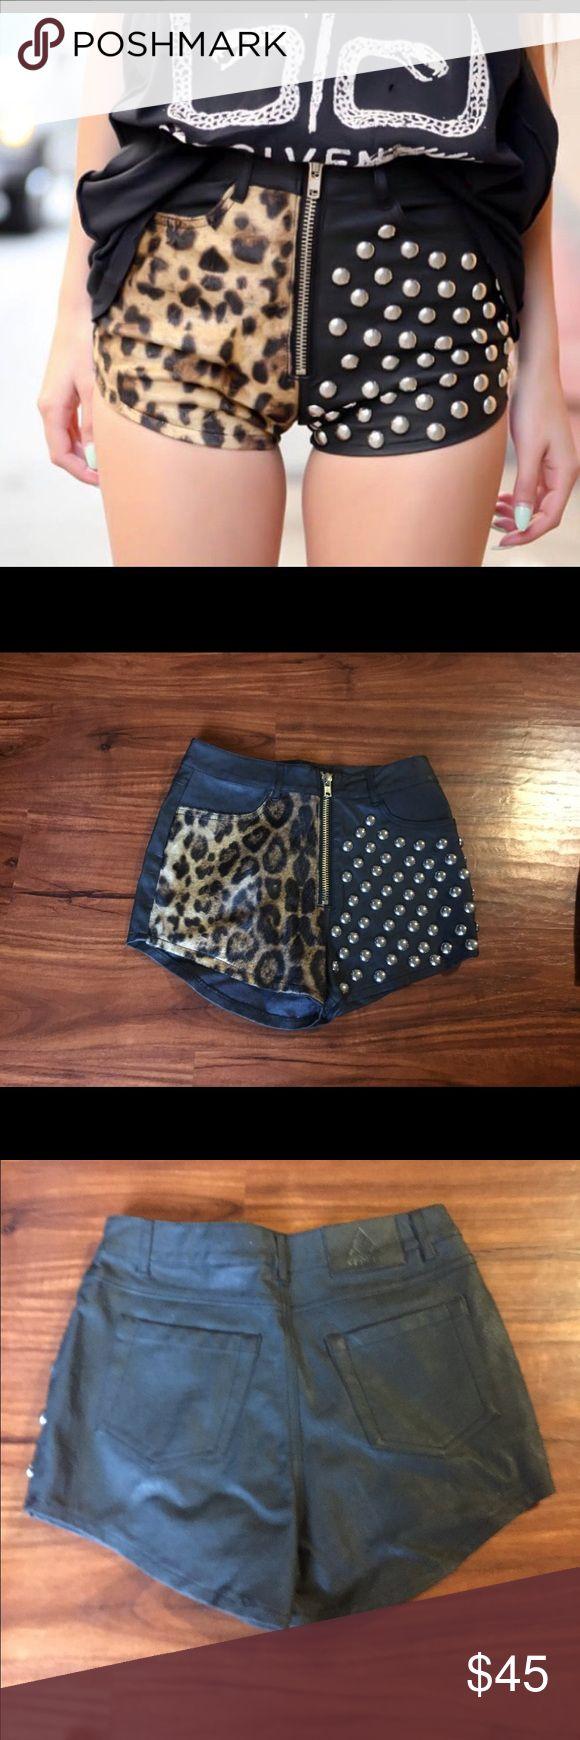 UNIF Leopard Leather Shorts UNIF Leopard Leather Shorts Size: 25 UNIF Shorts